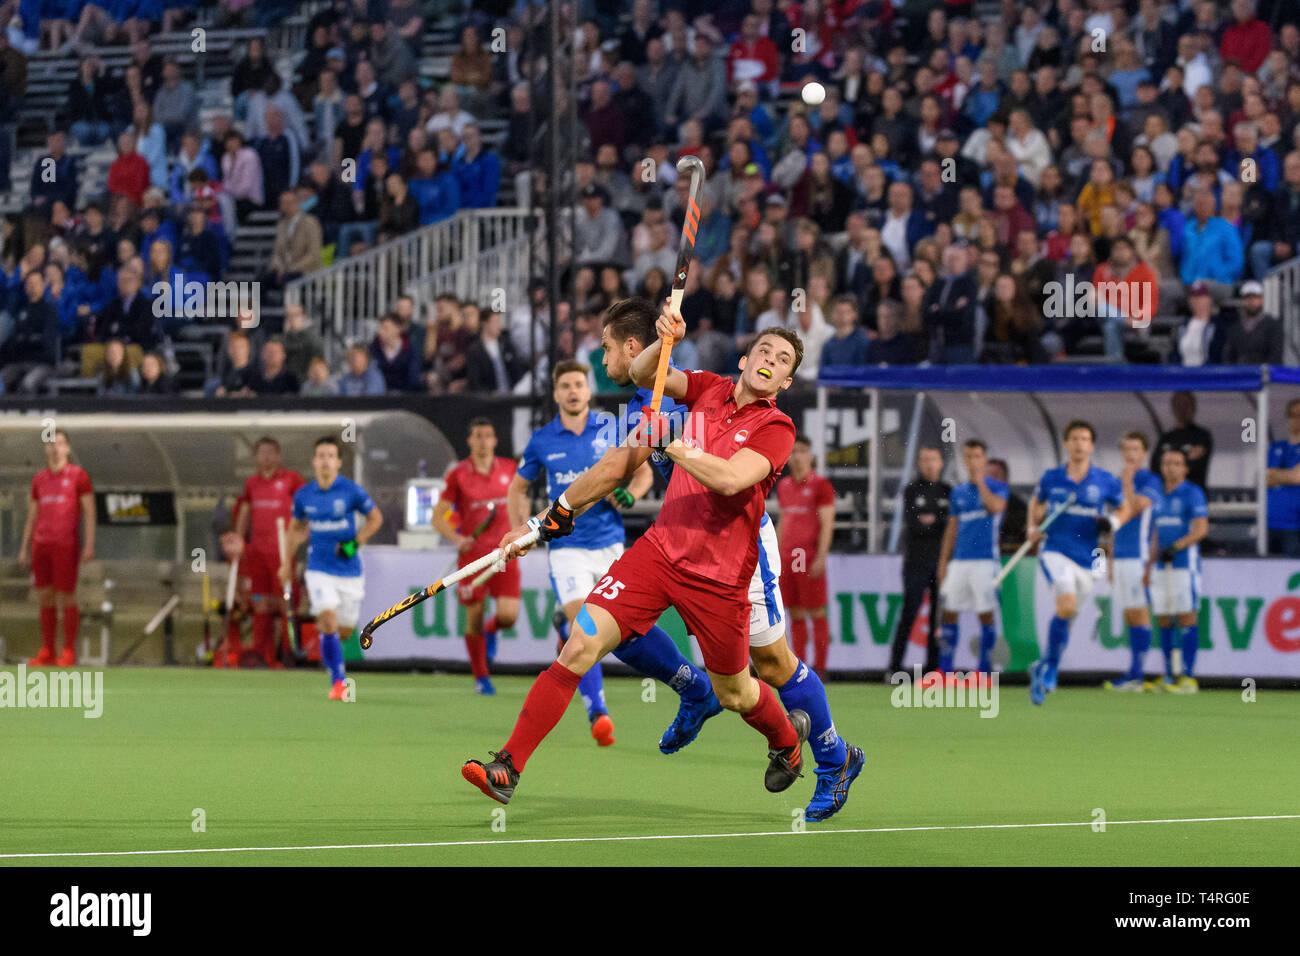 EINDHOVEN, 18-04-2019, Euro Hockey League 2019. Veranstaltungsort: HC Oranje-Rood. Eric Knobling während des Spiels SV Kampong vs Rot-Weiss Köln. Stockbild